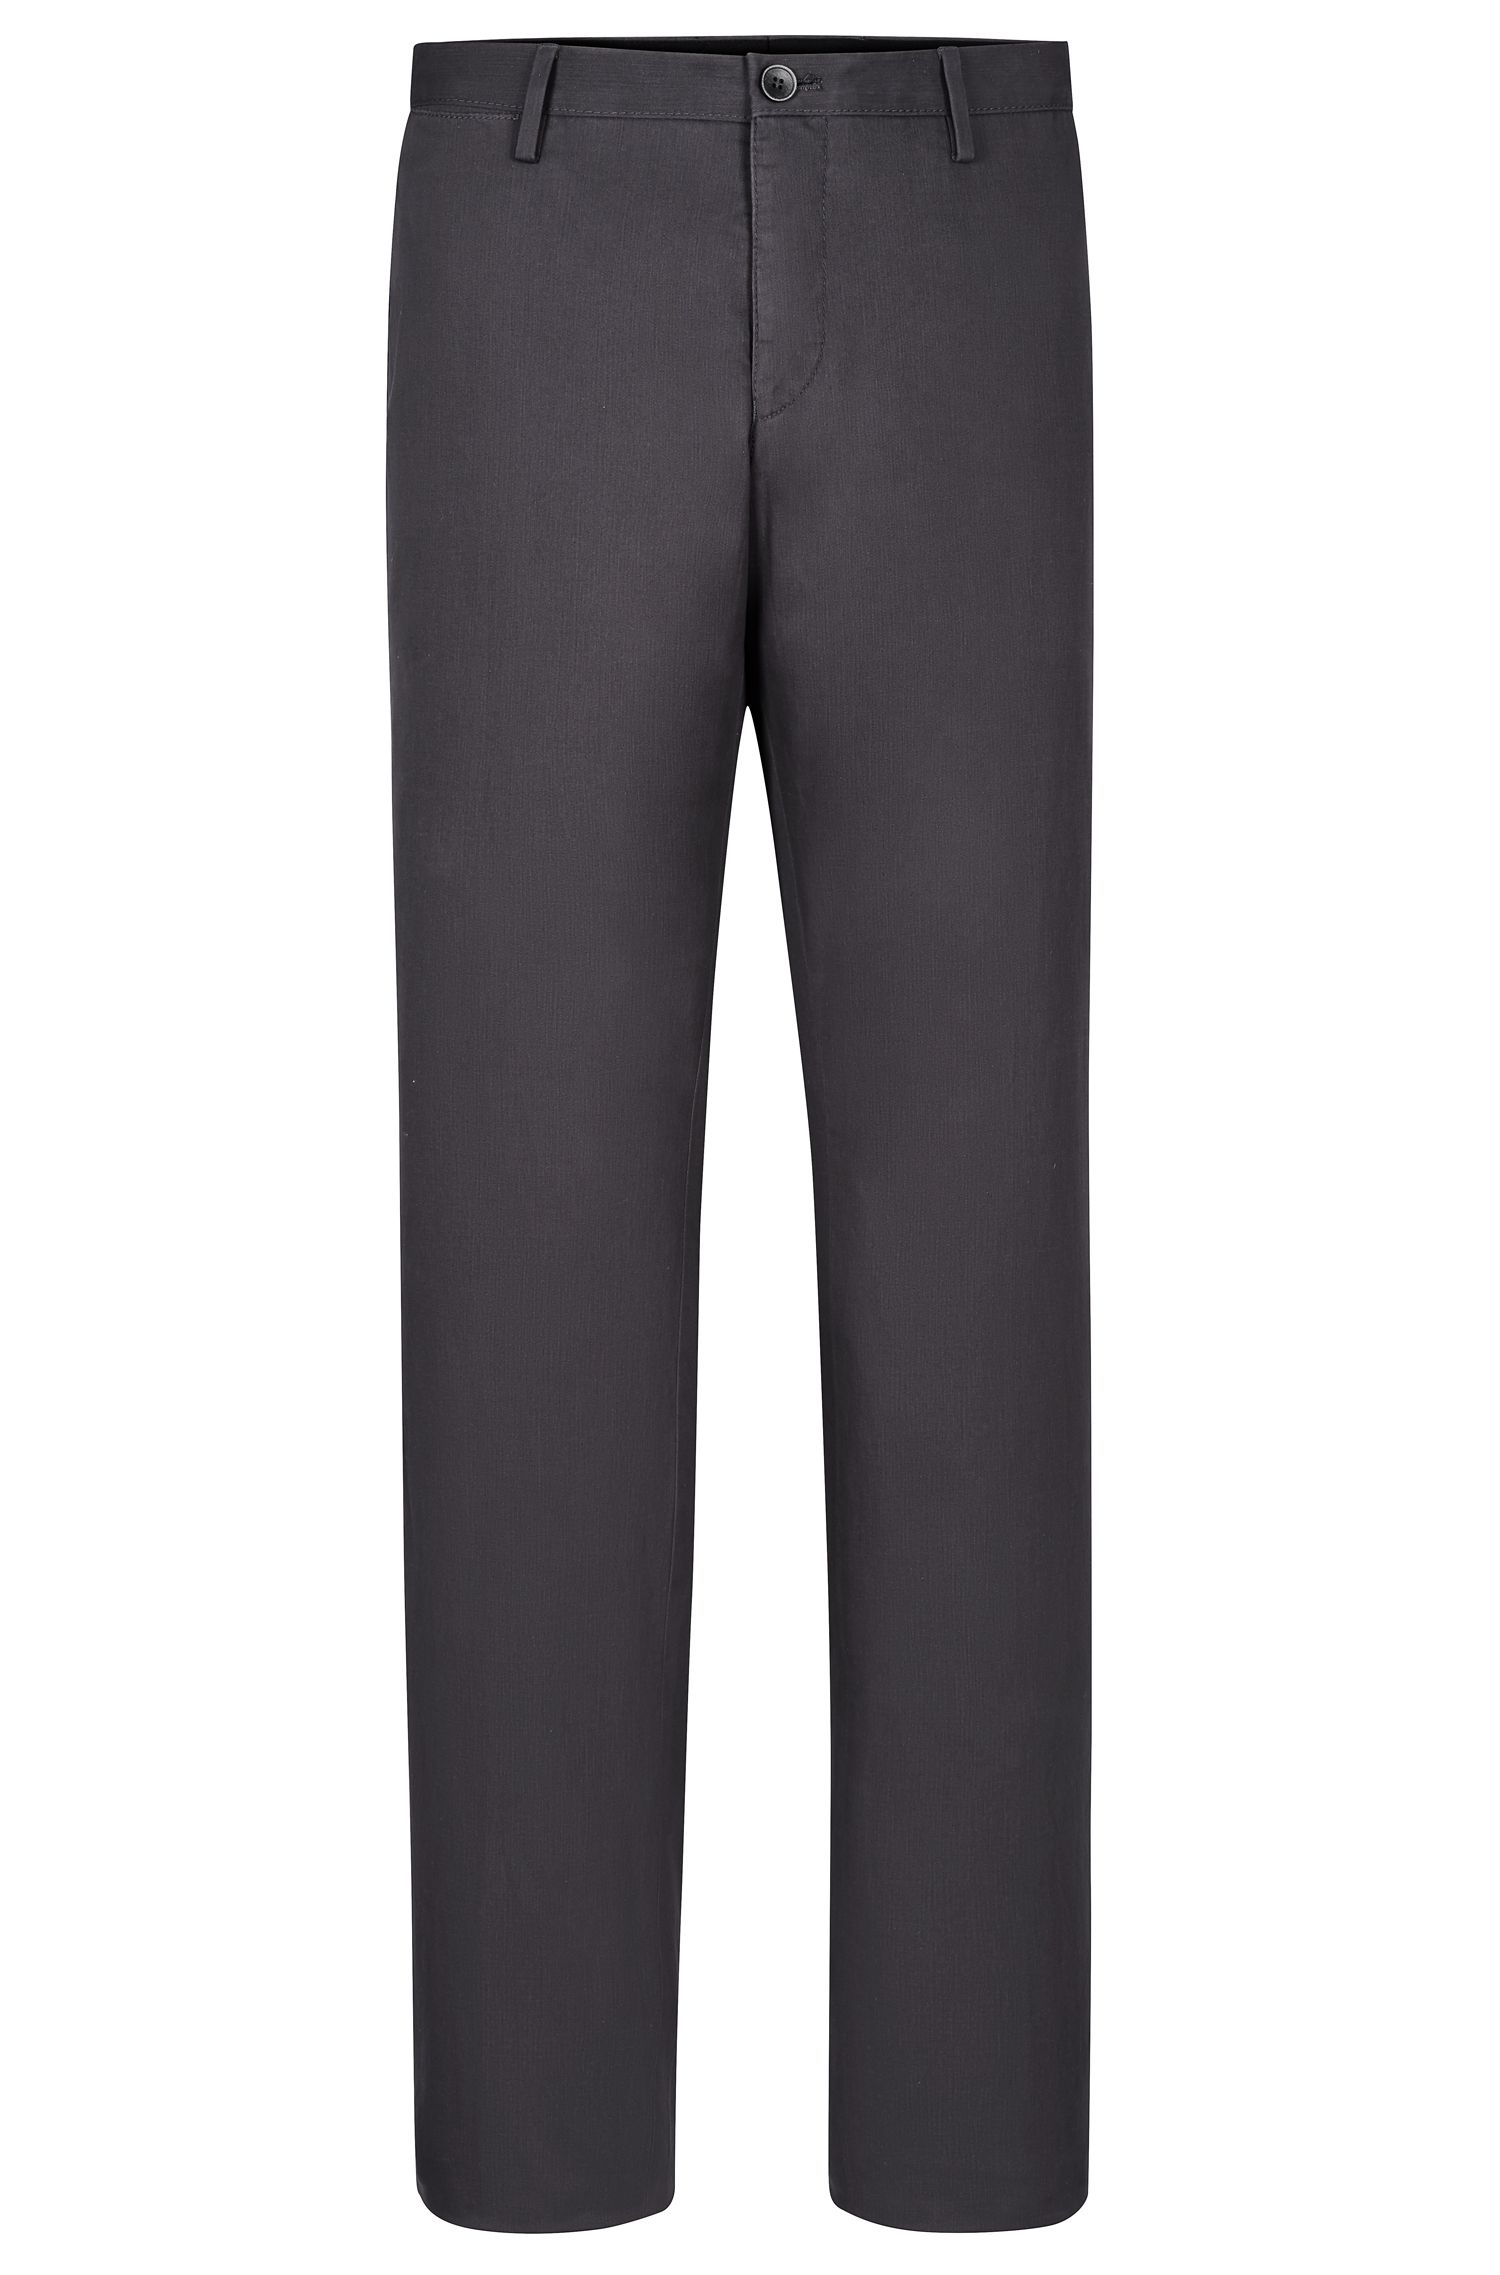 'Stanino W' | Slim Fit, Stretch Cotton Chino Pants